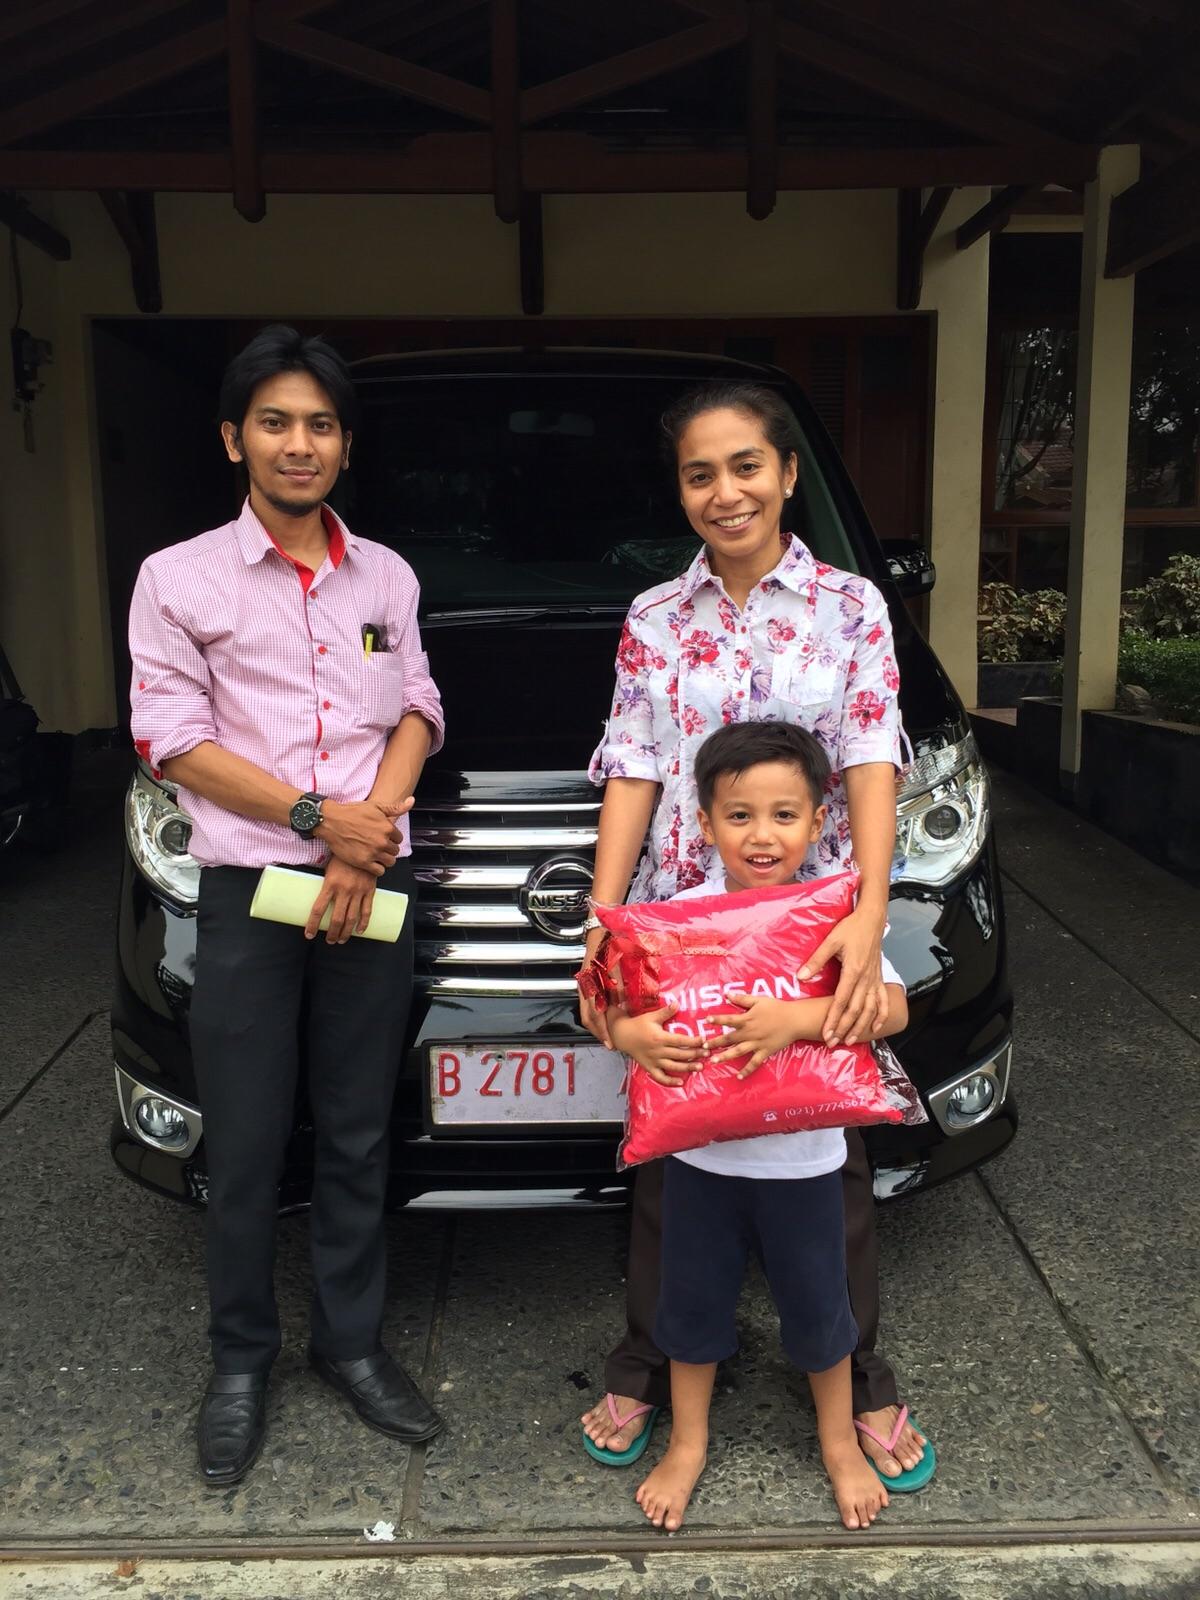 Terimakasih atas kepercayaan dr.Afra & Keluarga yg telah membeli Nissan All New Serena melalui media www.touchnissan.com.  Semoga Berkah ya Bu...